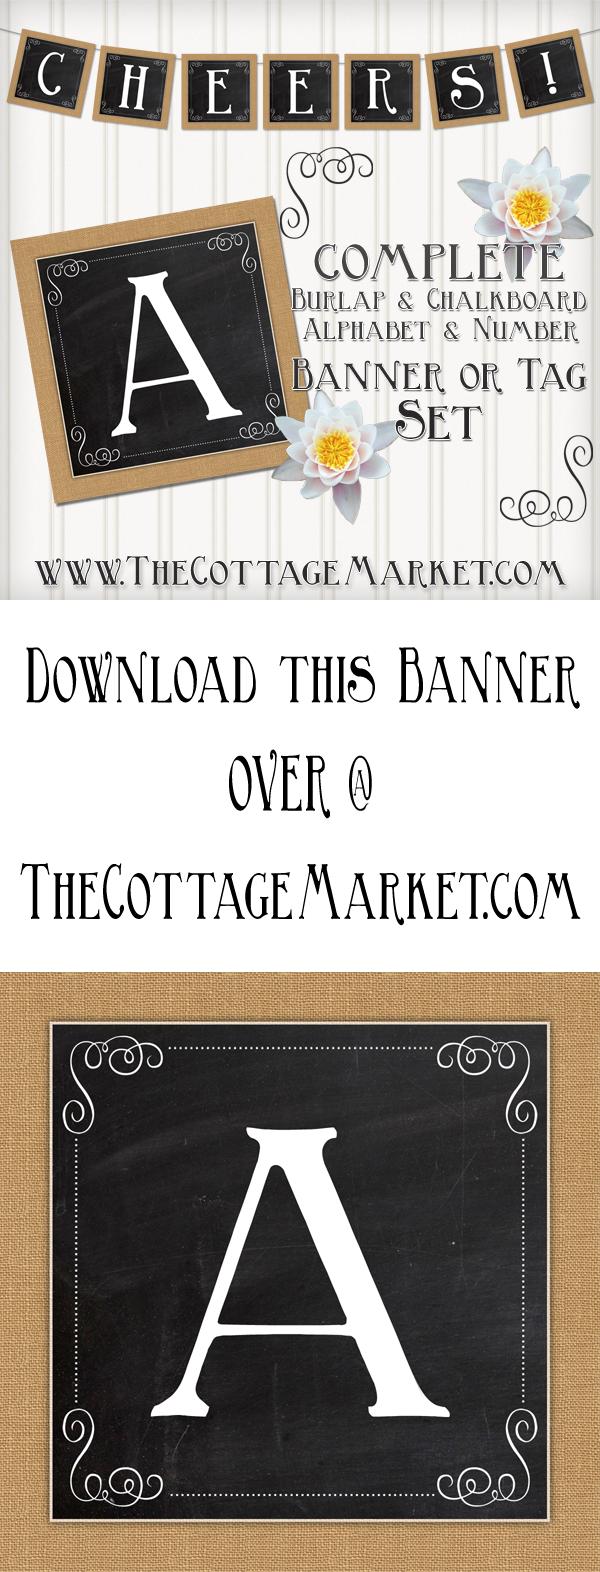 TheCottageMarket-Burlap&Chalkboard-tower